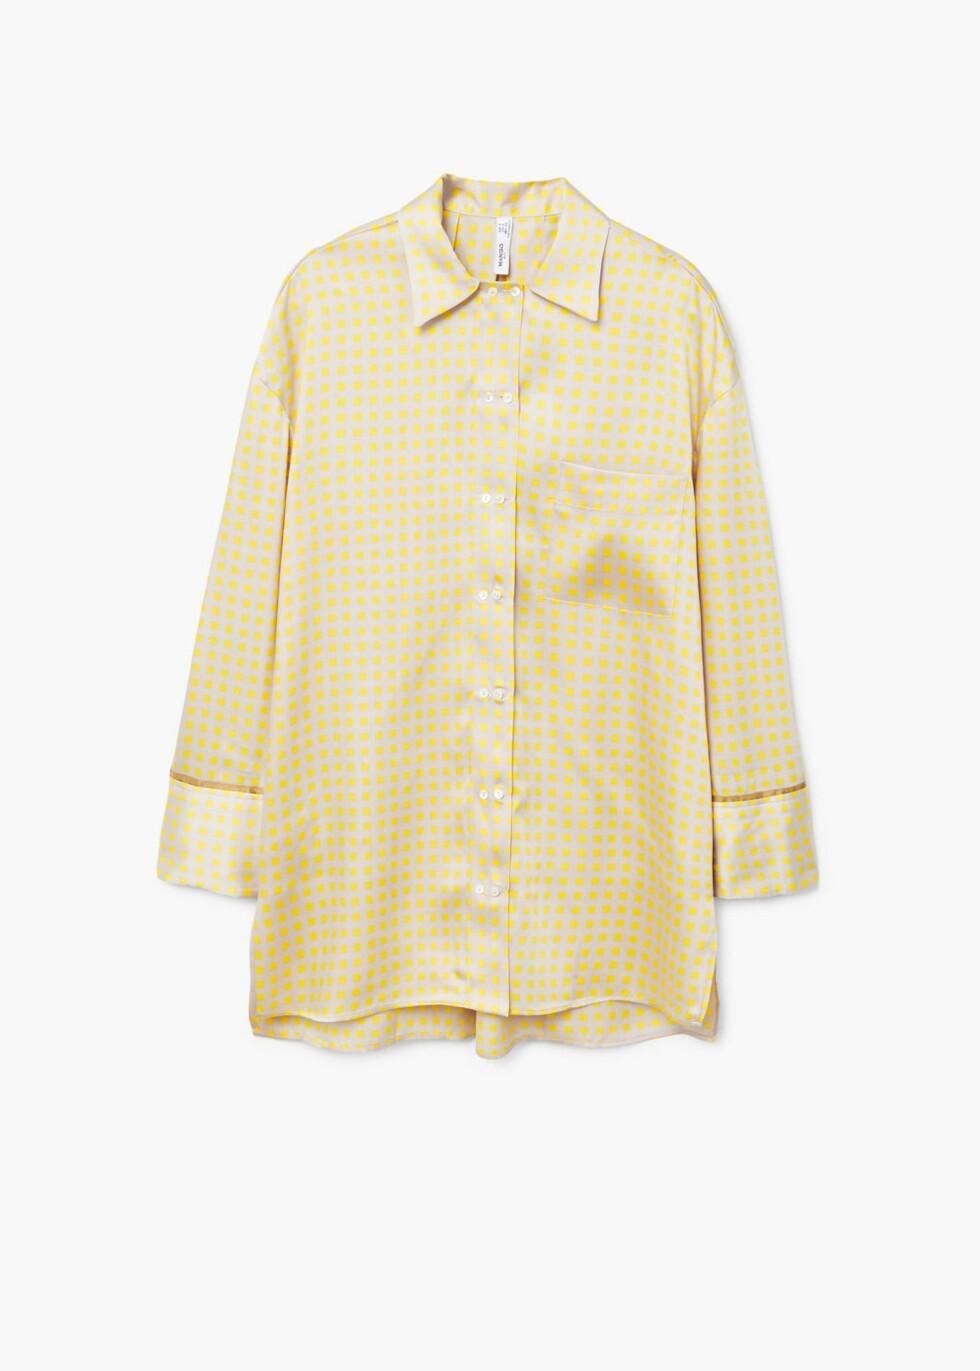 Skjorte fra Mango  699,-  https://shop.mango.com/no/damer/skjorter-skjorter/skjorte-i-pyjamas-stil-med-m%C3%B8nster_21055714.html?c=11&n=1&s=search